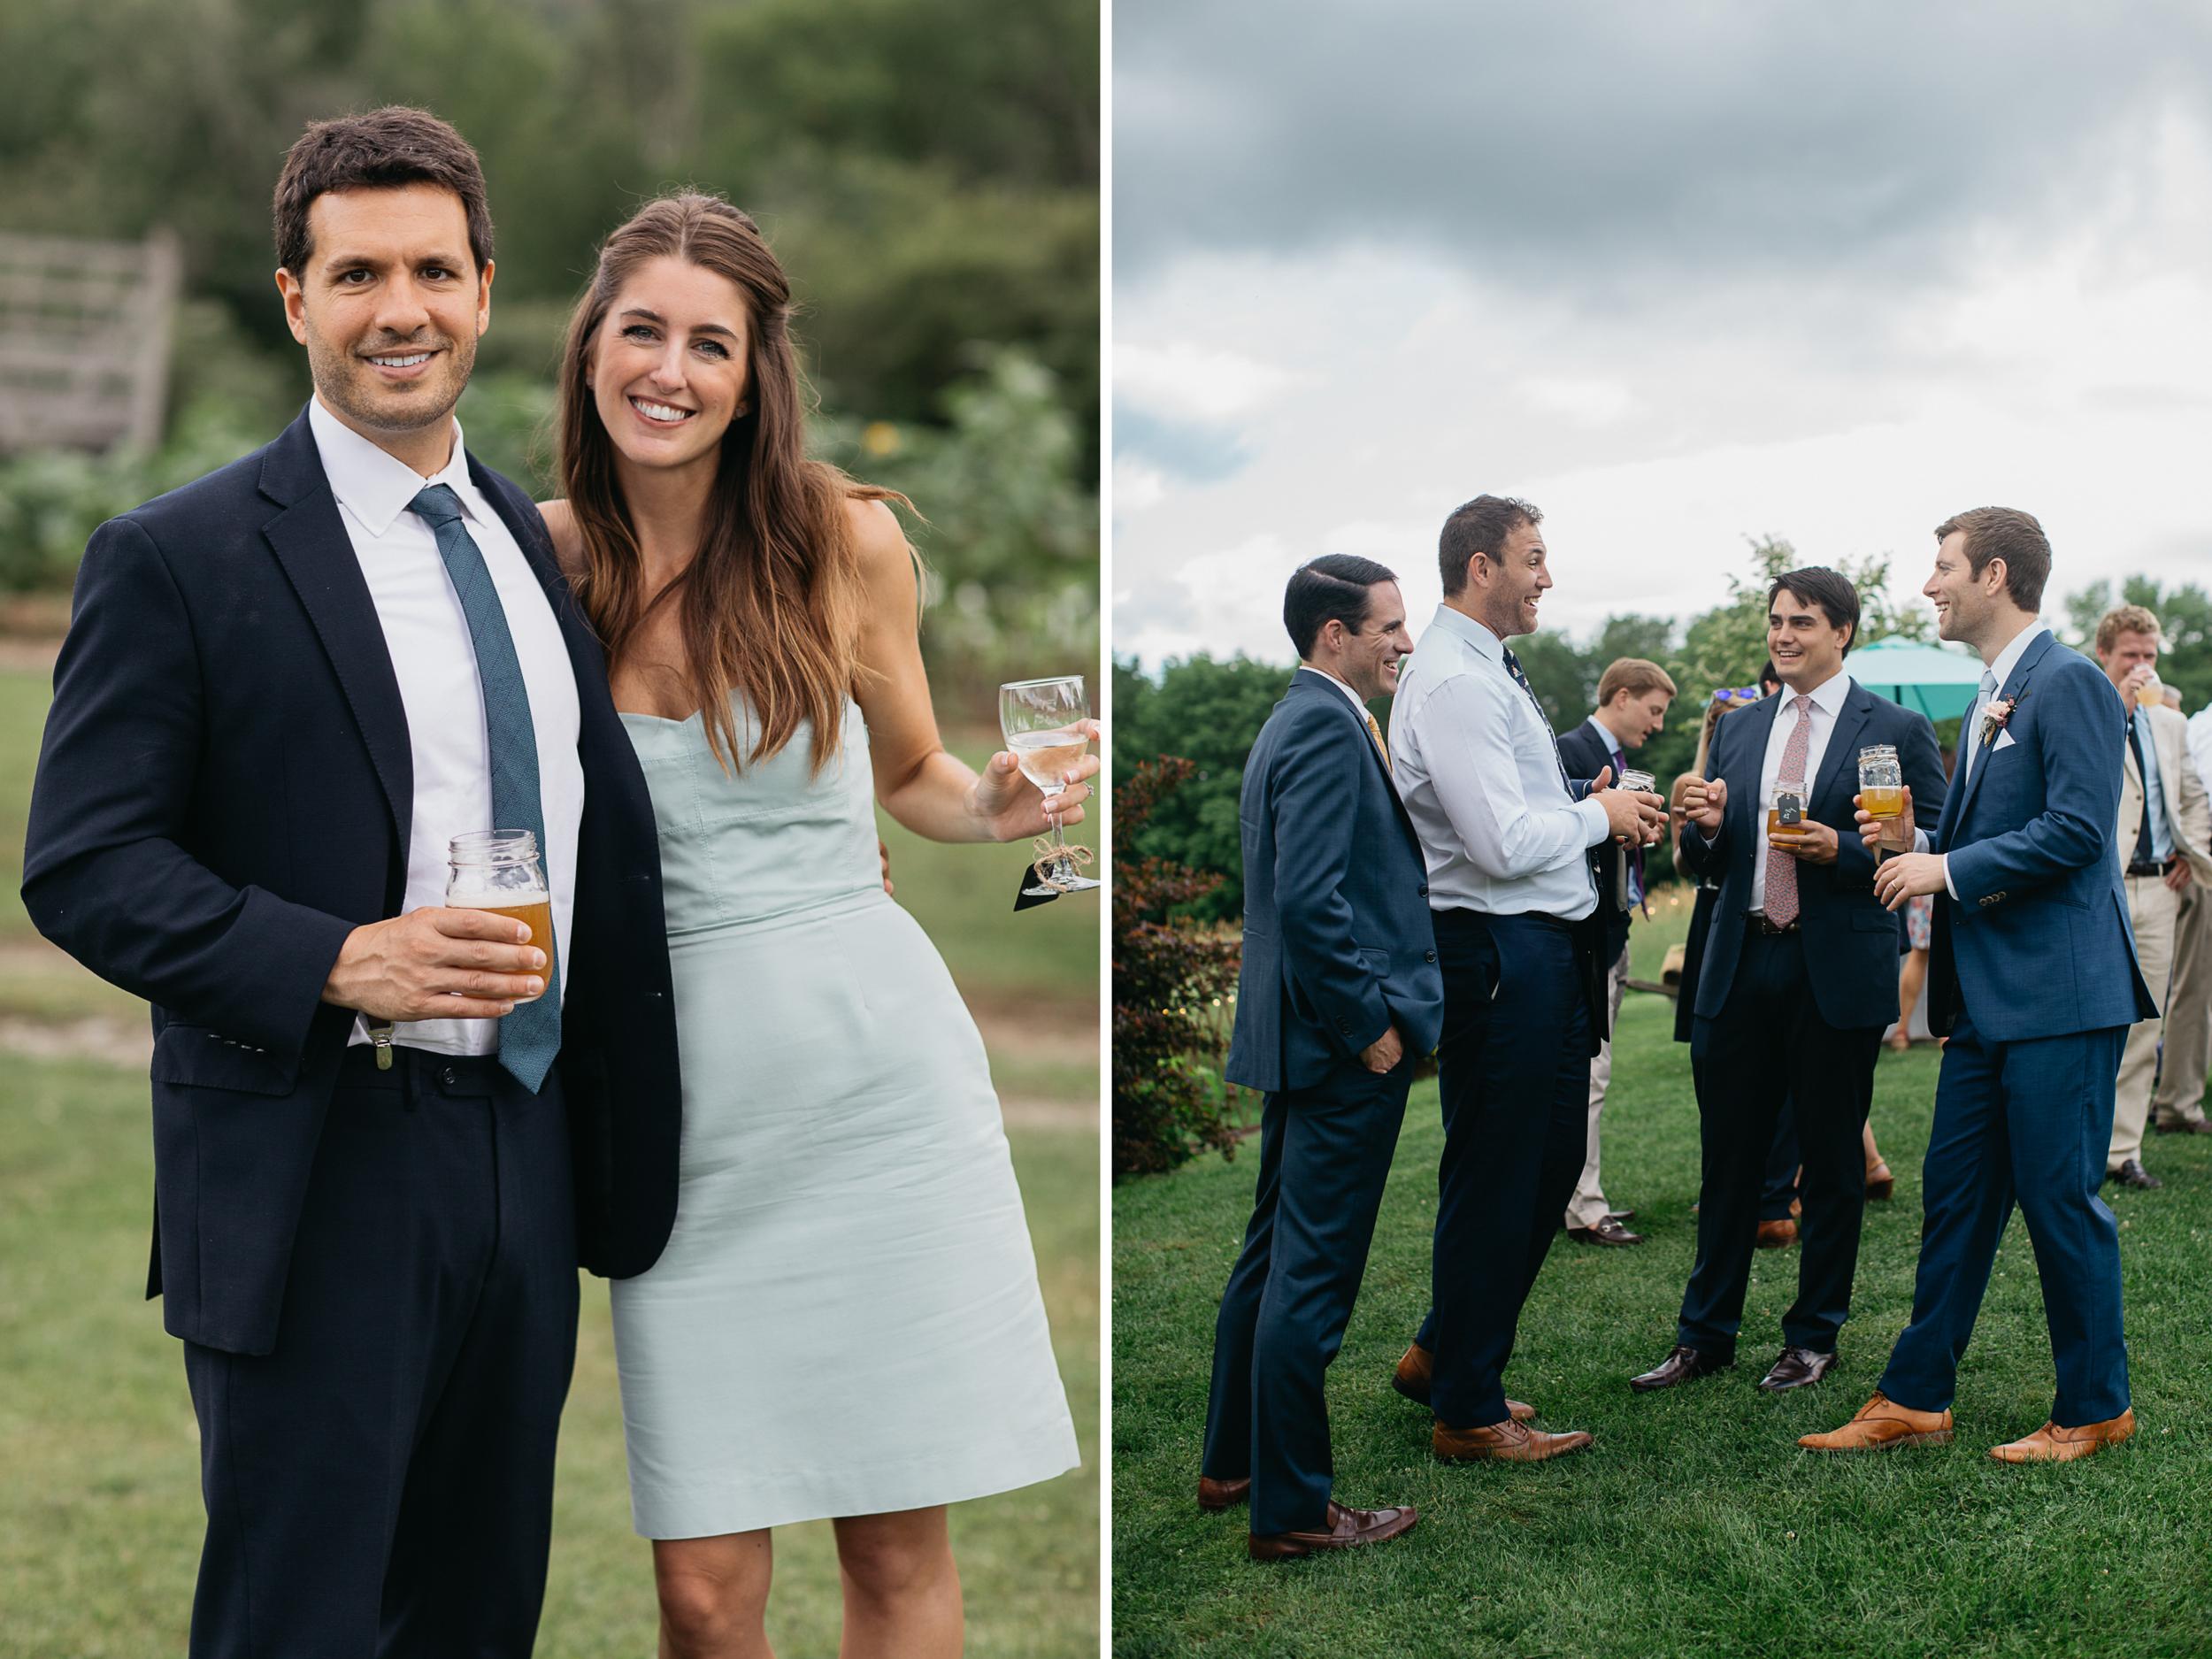 Karen_Alex_Bliss_ridge_farm_Vermont_wedding024.jpg